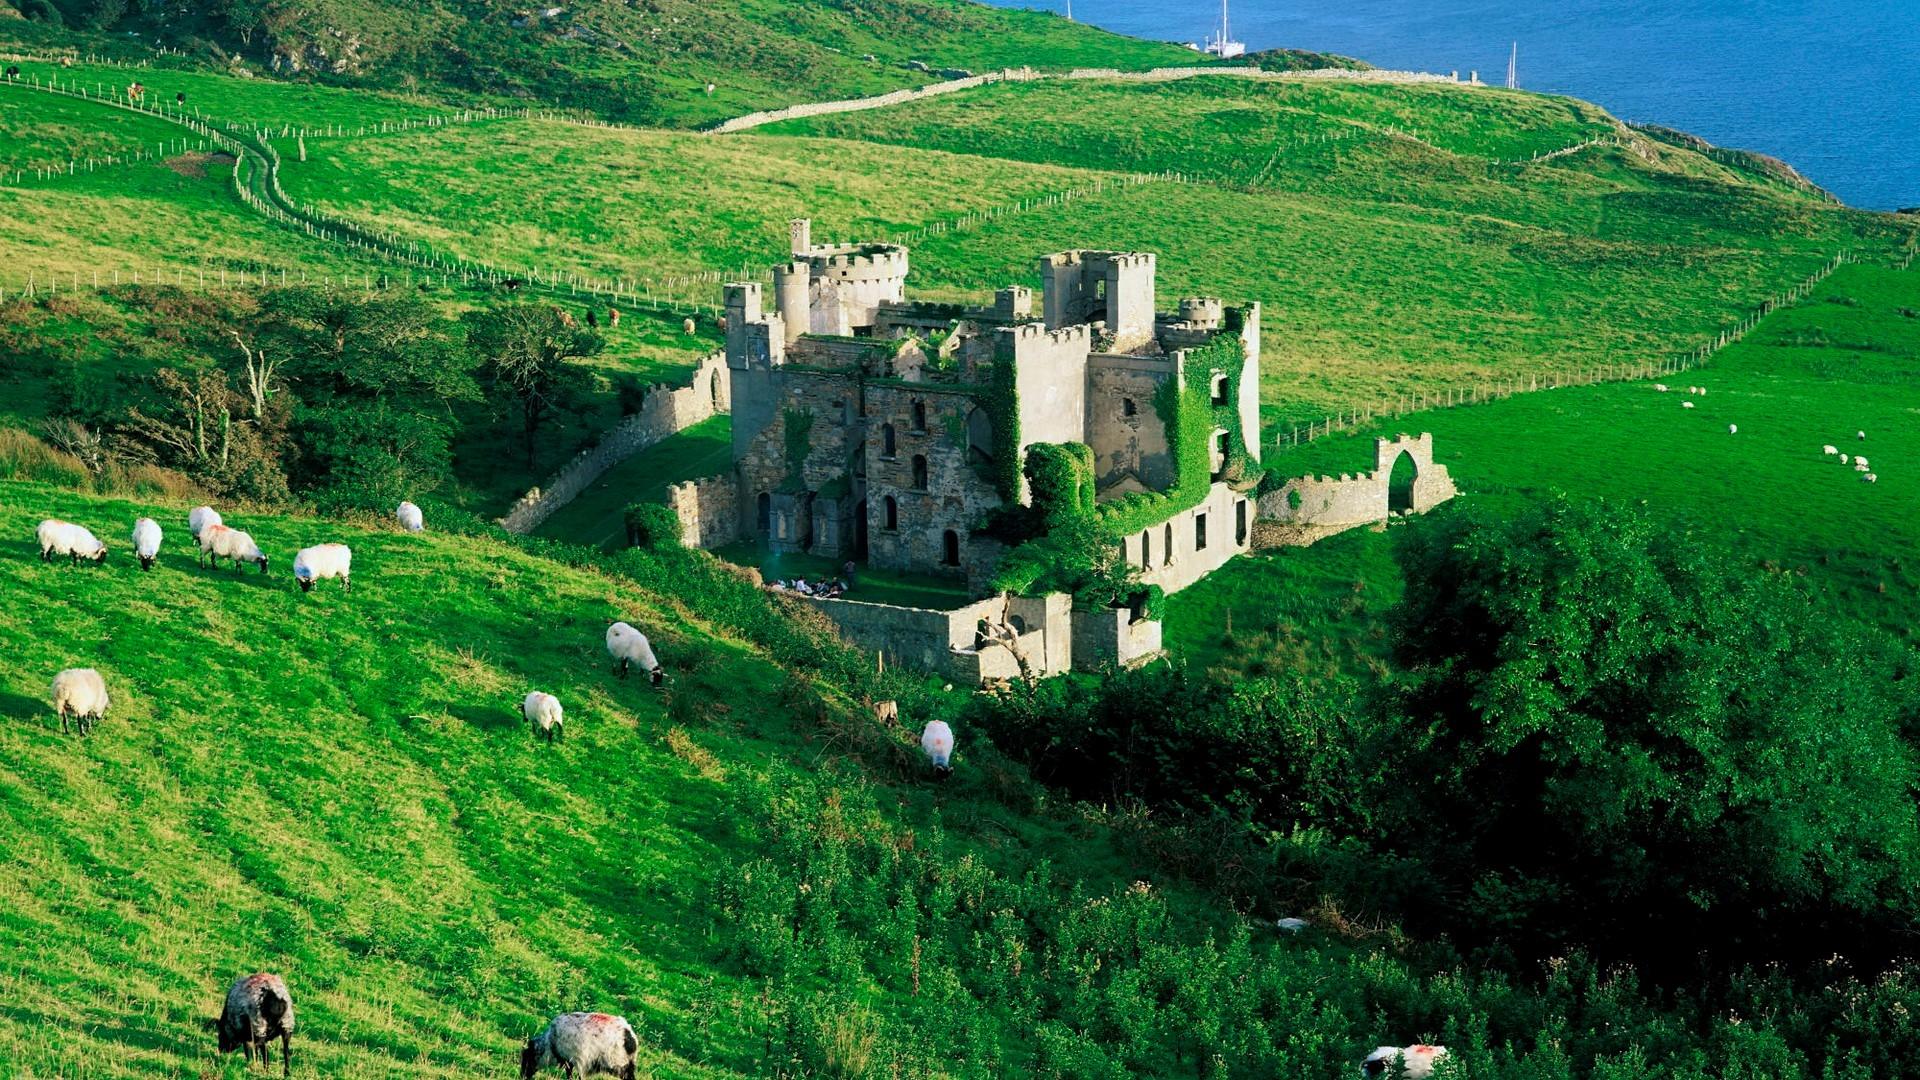 Clifden Castle Ireland Wallpapers HD Wallpapers 1920x1080